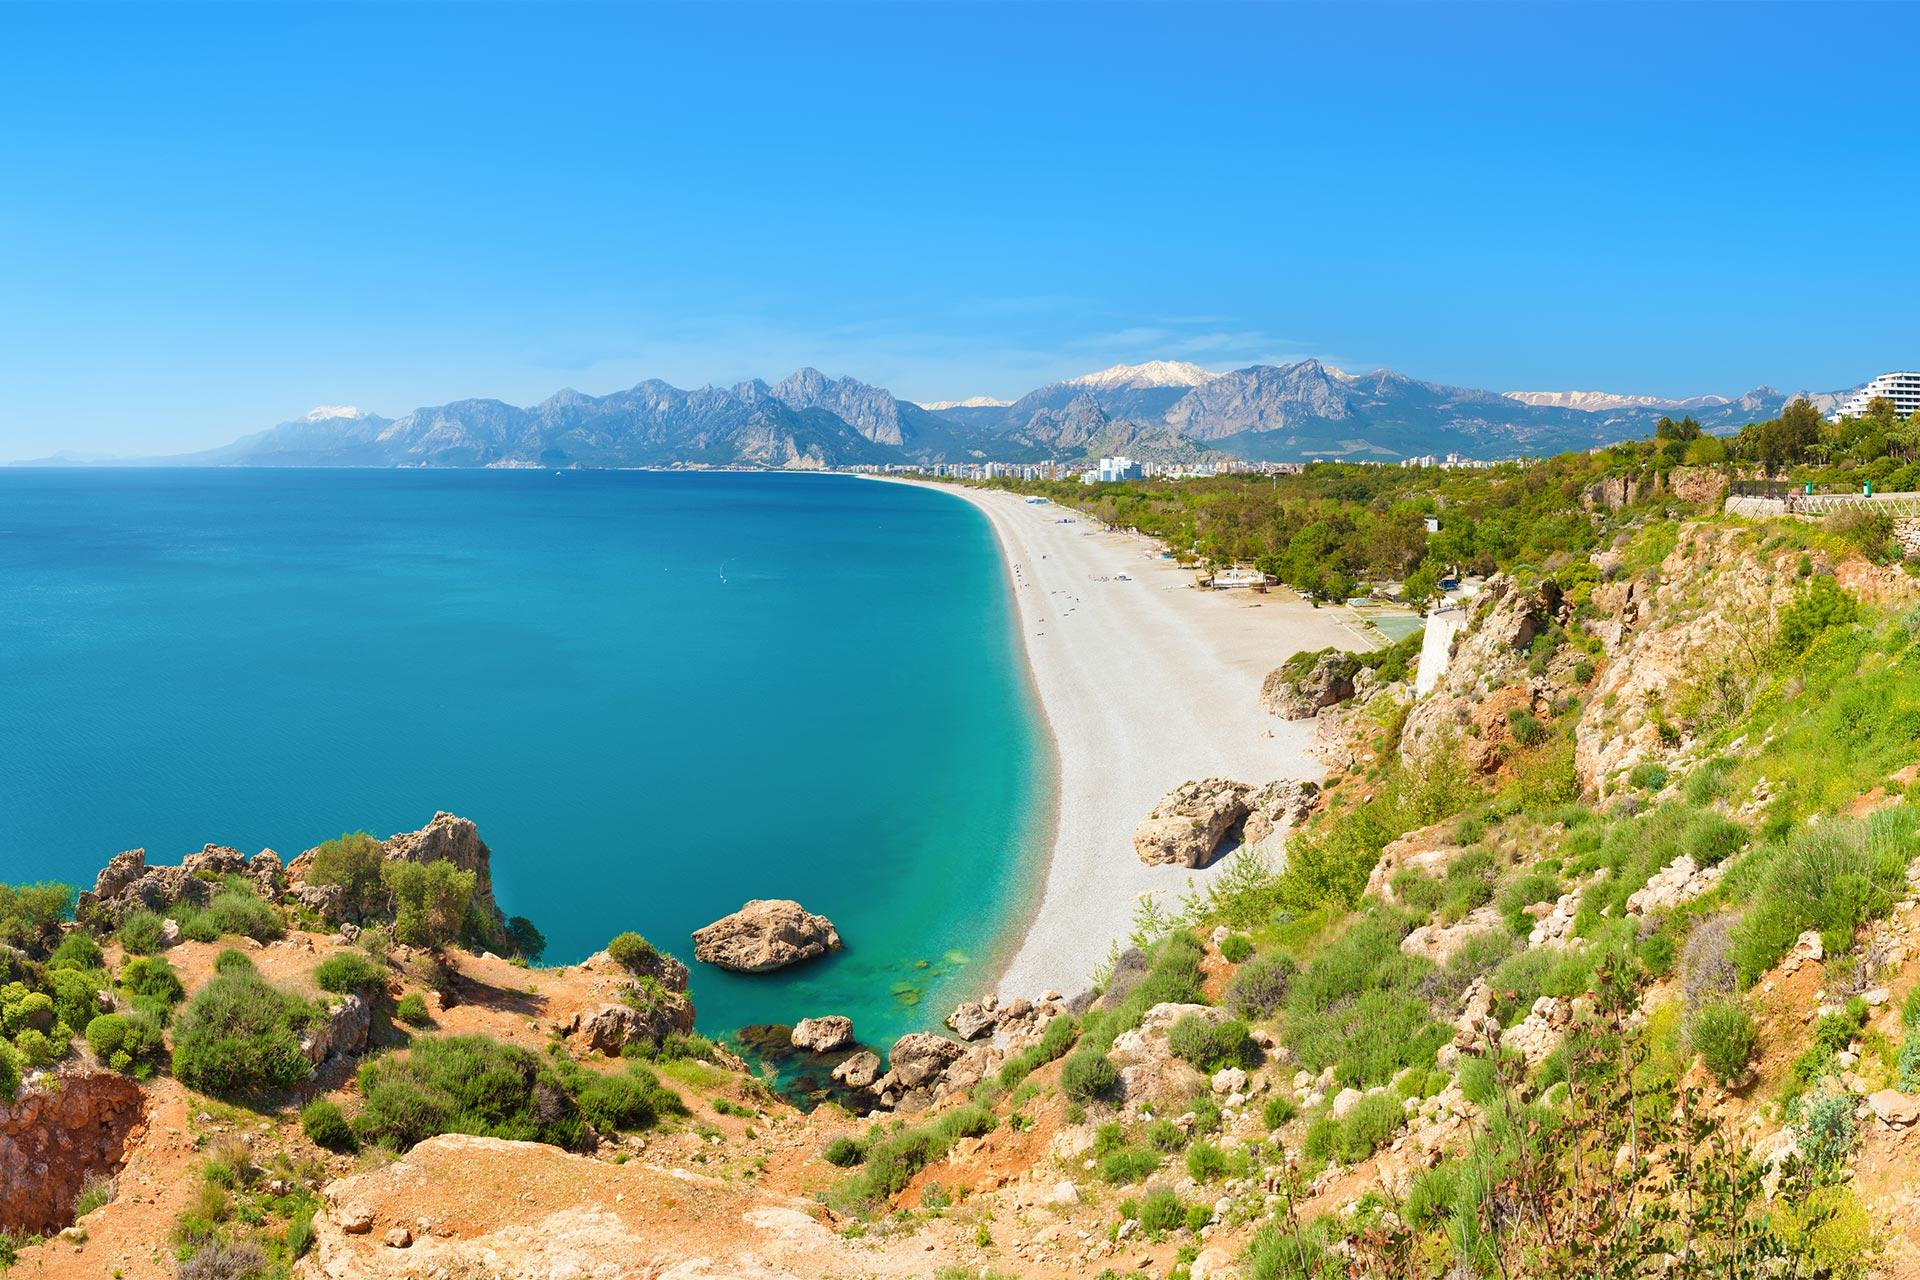 Sejur plaja Antalya, Turcia, 8 zile - charter 2021